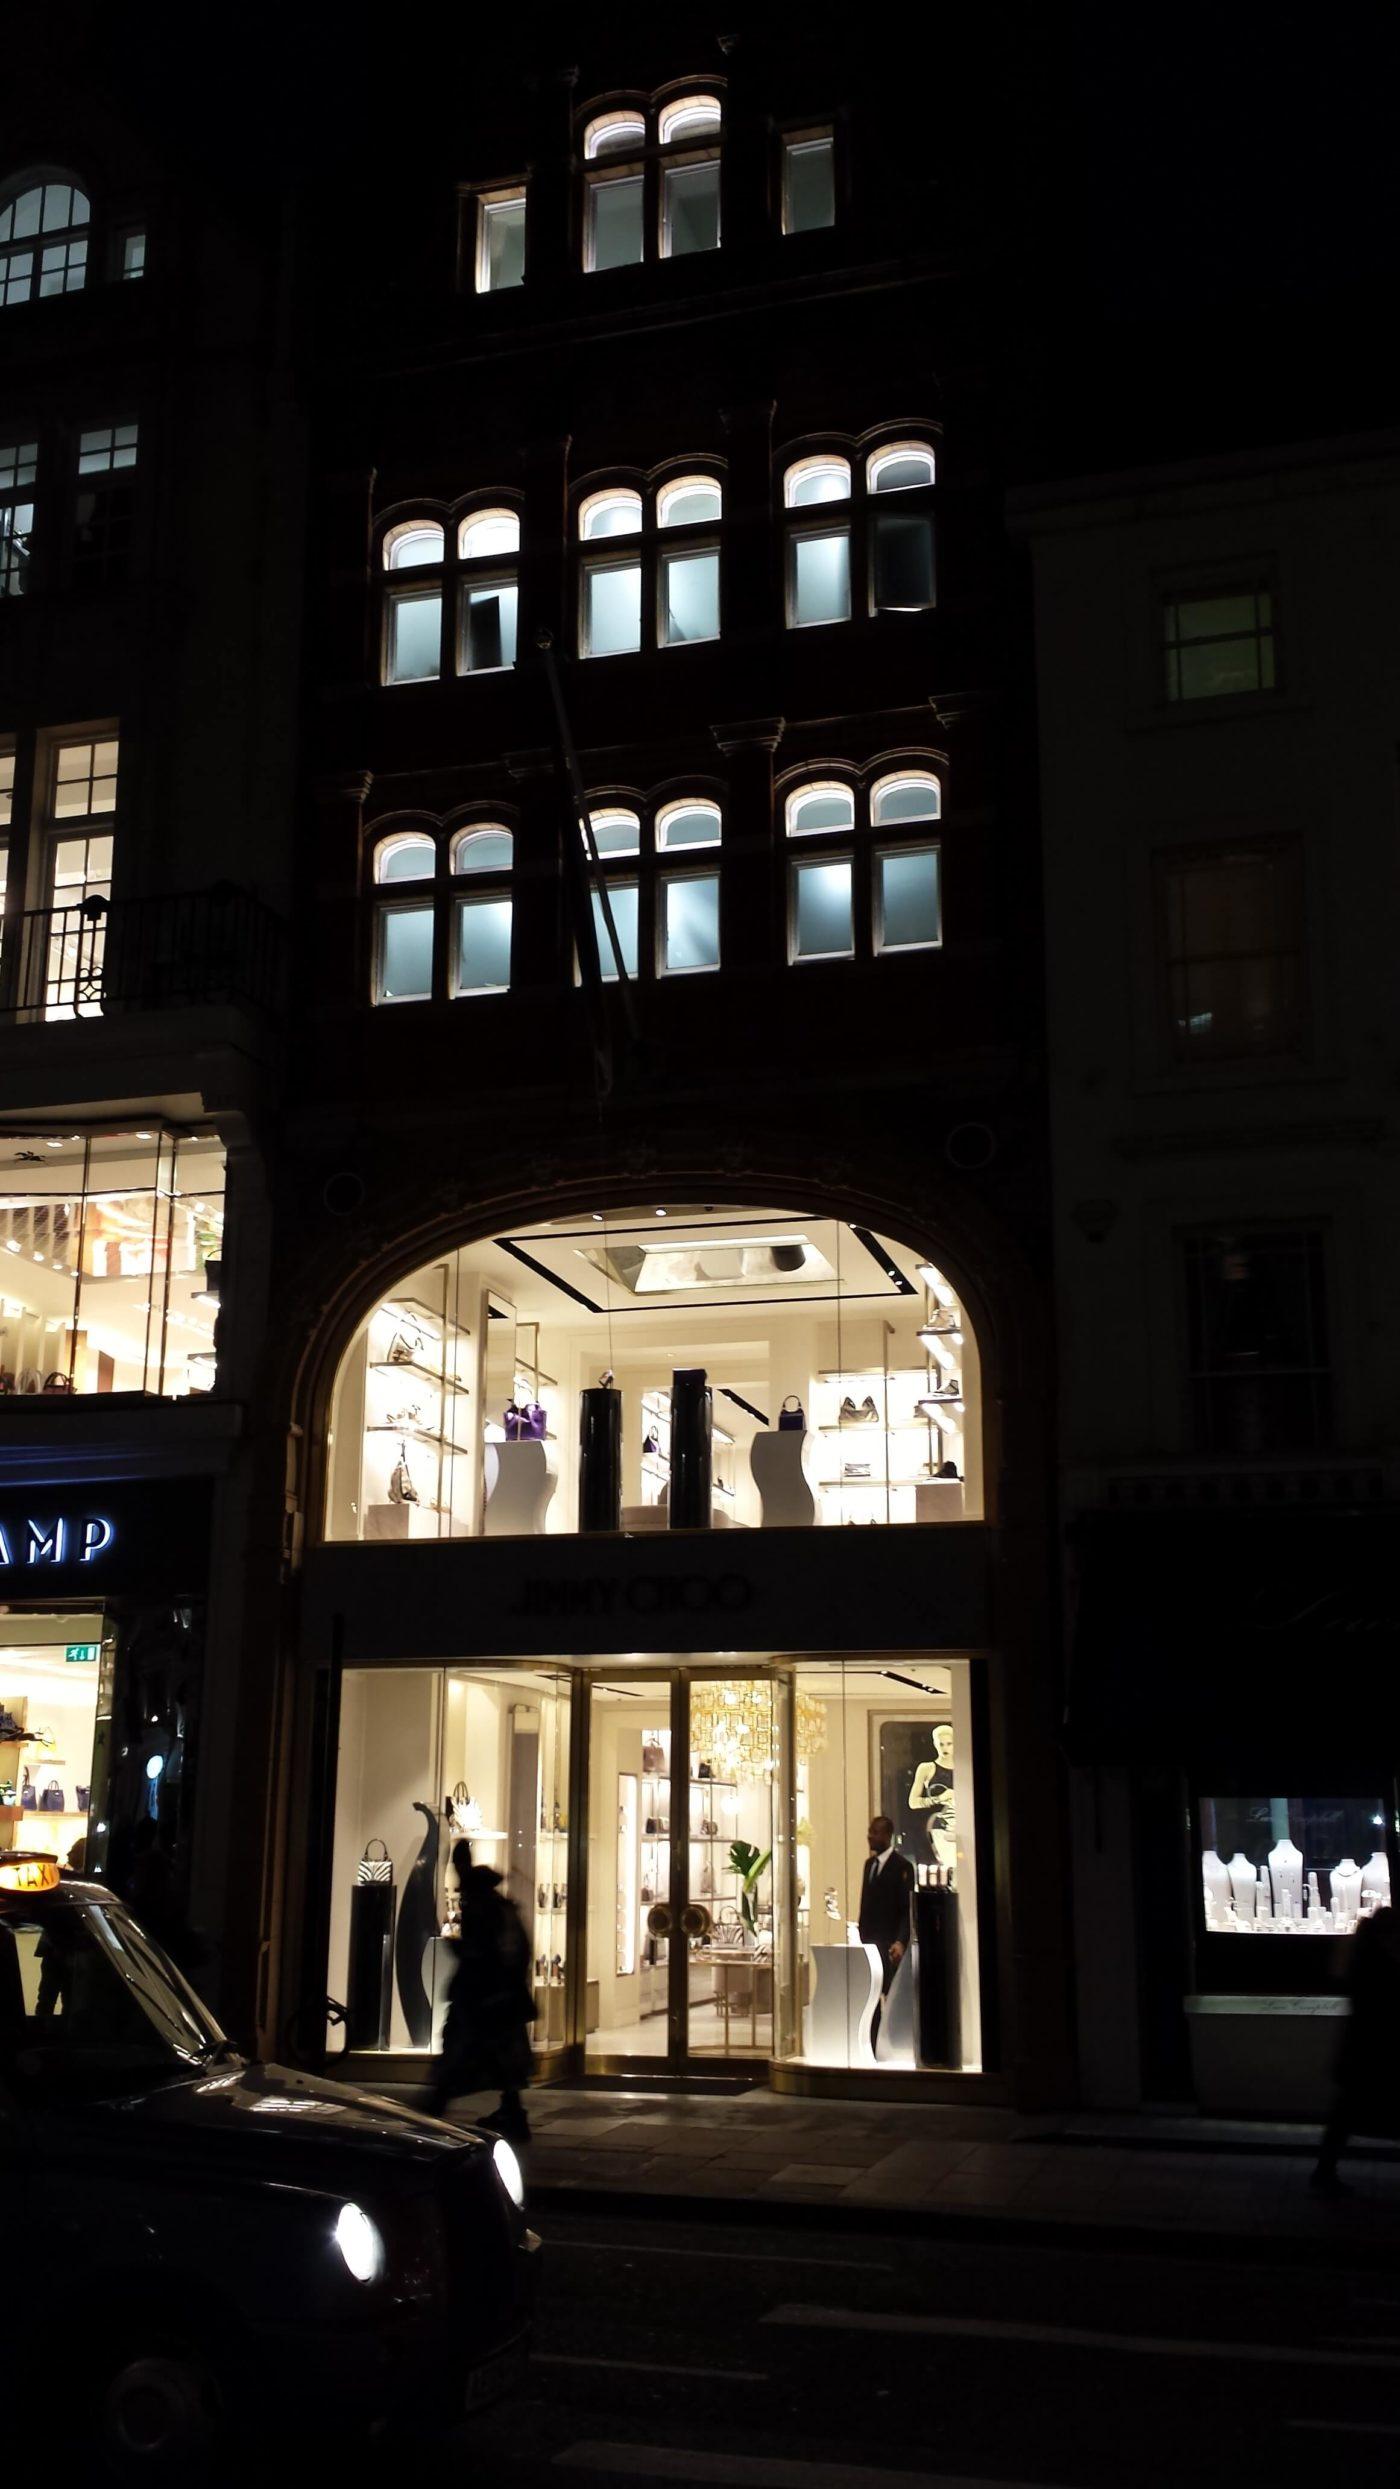 facade-at-night-jimmy-choo-london-mjlighting